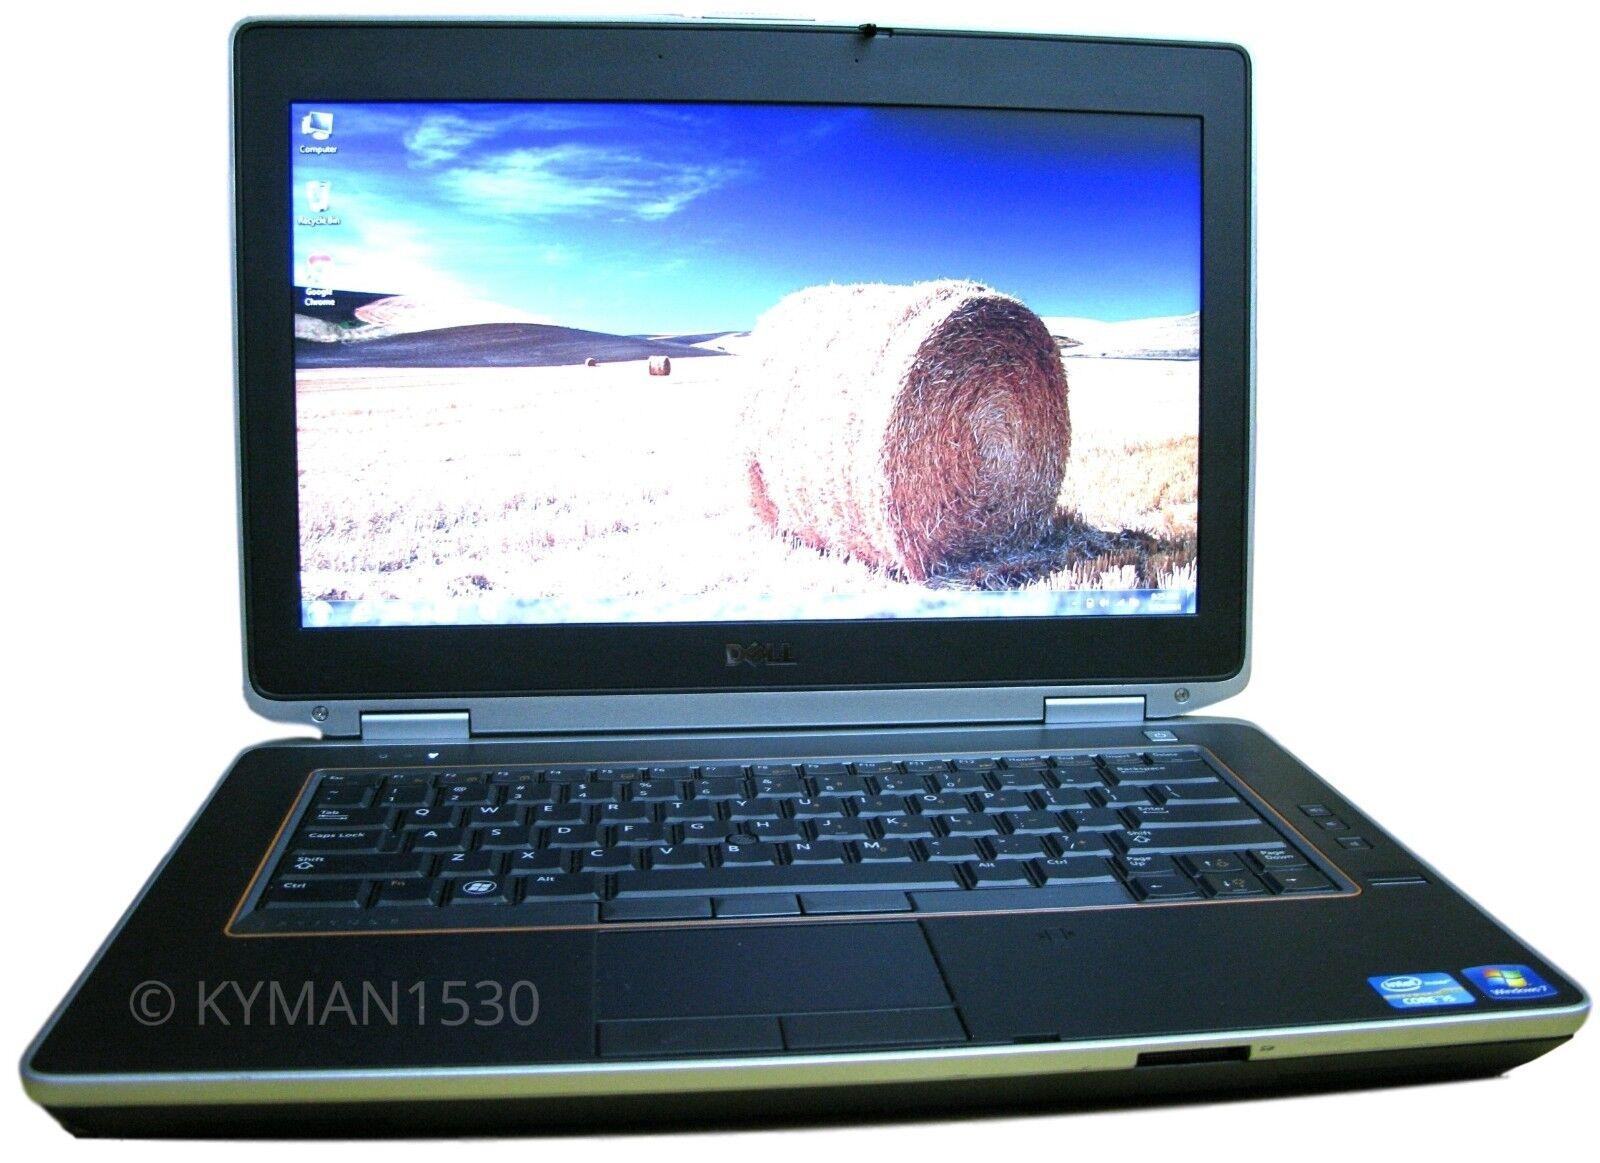 Laptop - Dell Latitude E6420 Laptop Windows 7 Core i5 2.5 Ghz 8GB RAM 1TB HD DVDRW WIFI